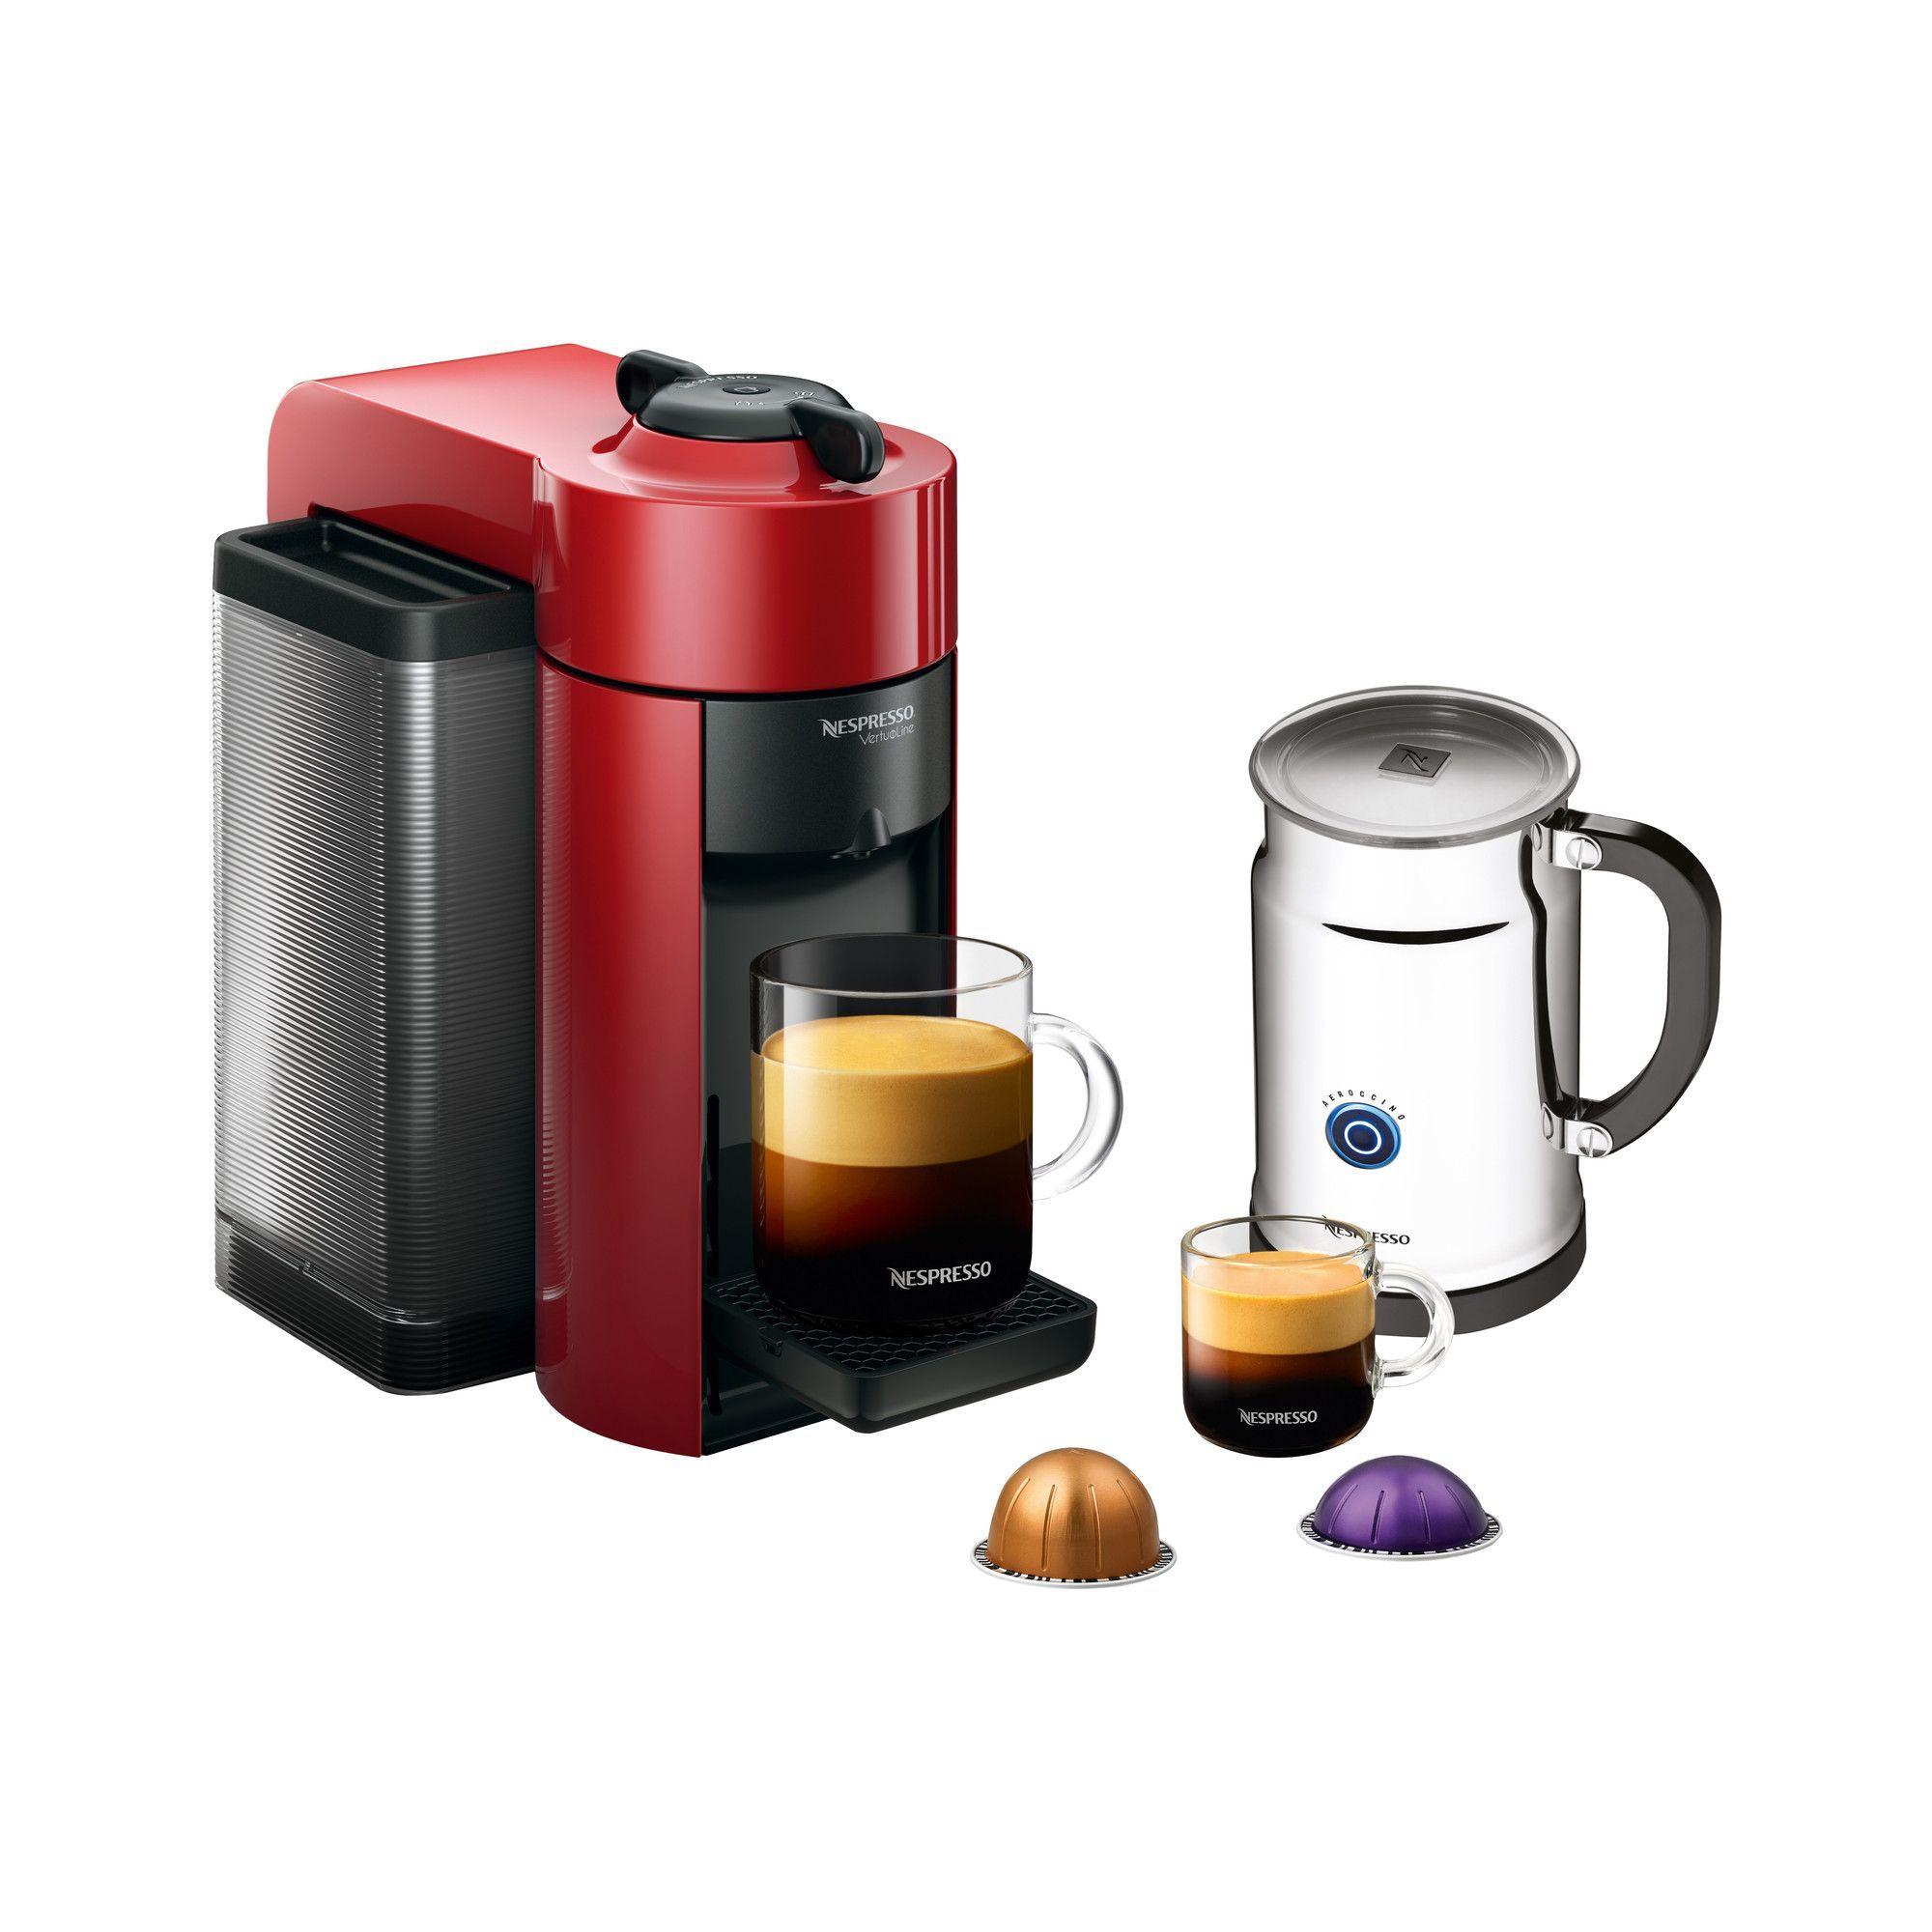 Evoluo Aerocinno Espresso Maker with Aeroccino Plus Milk